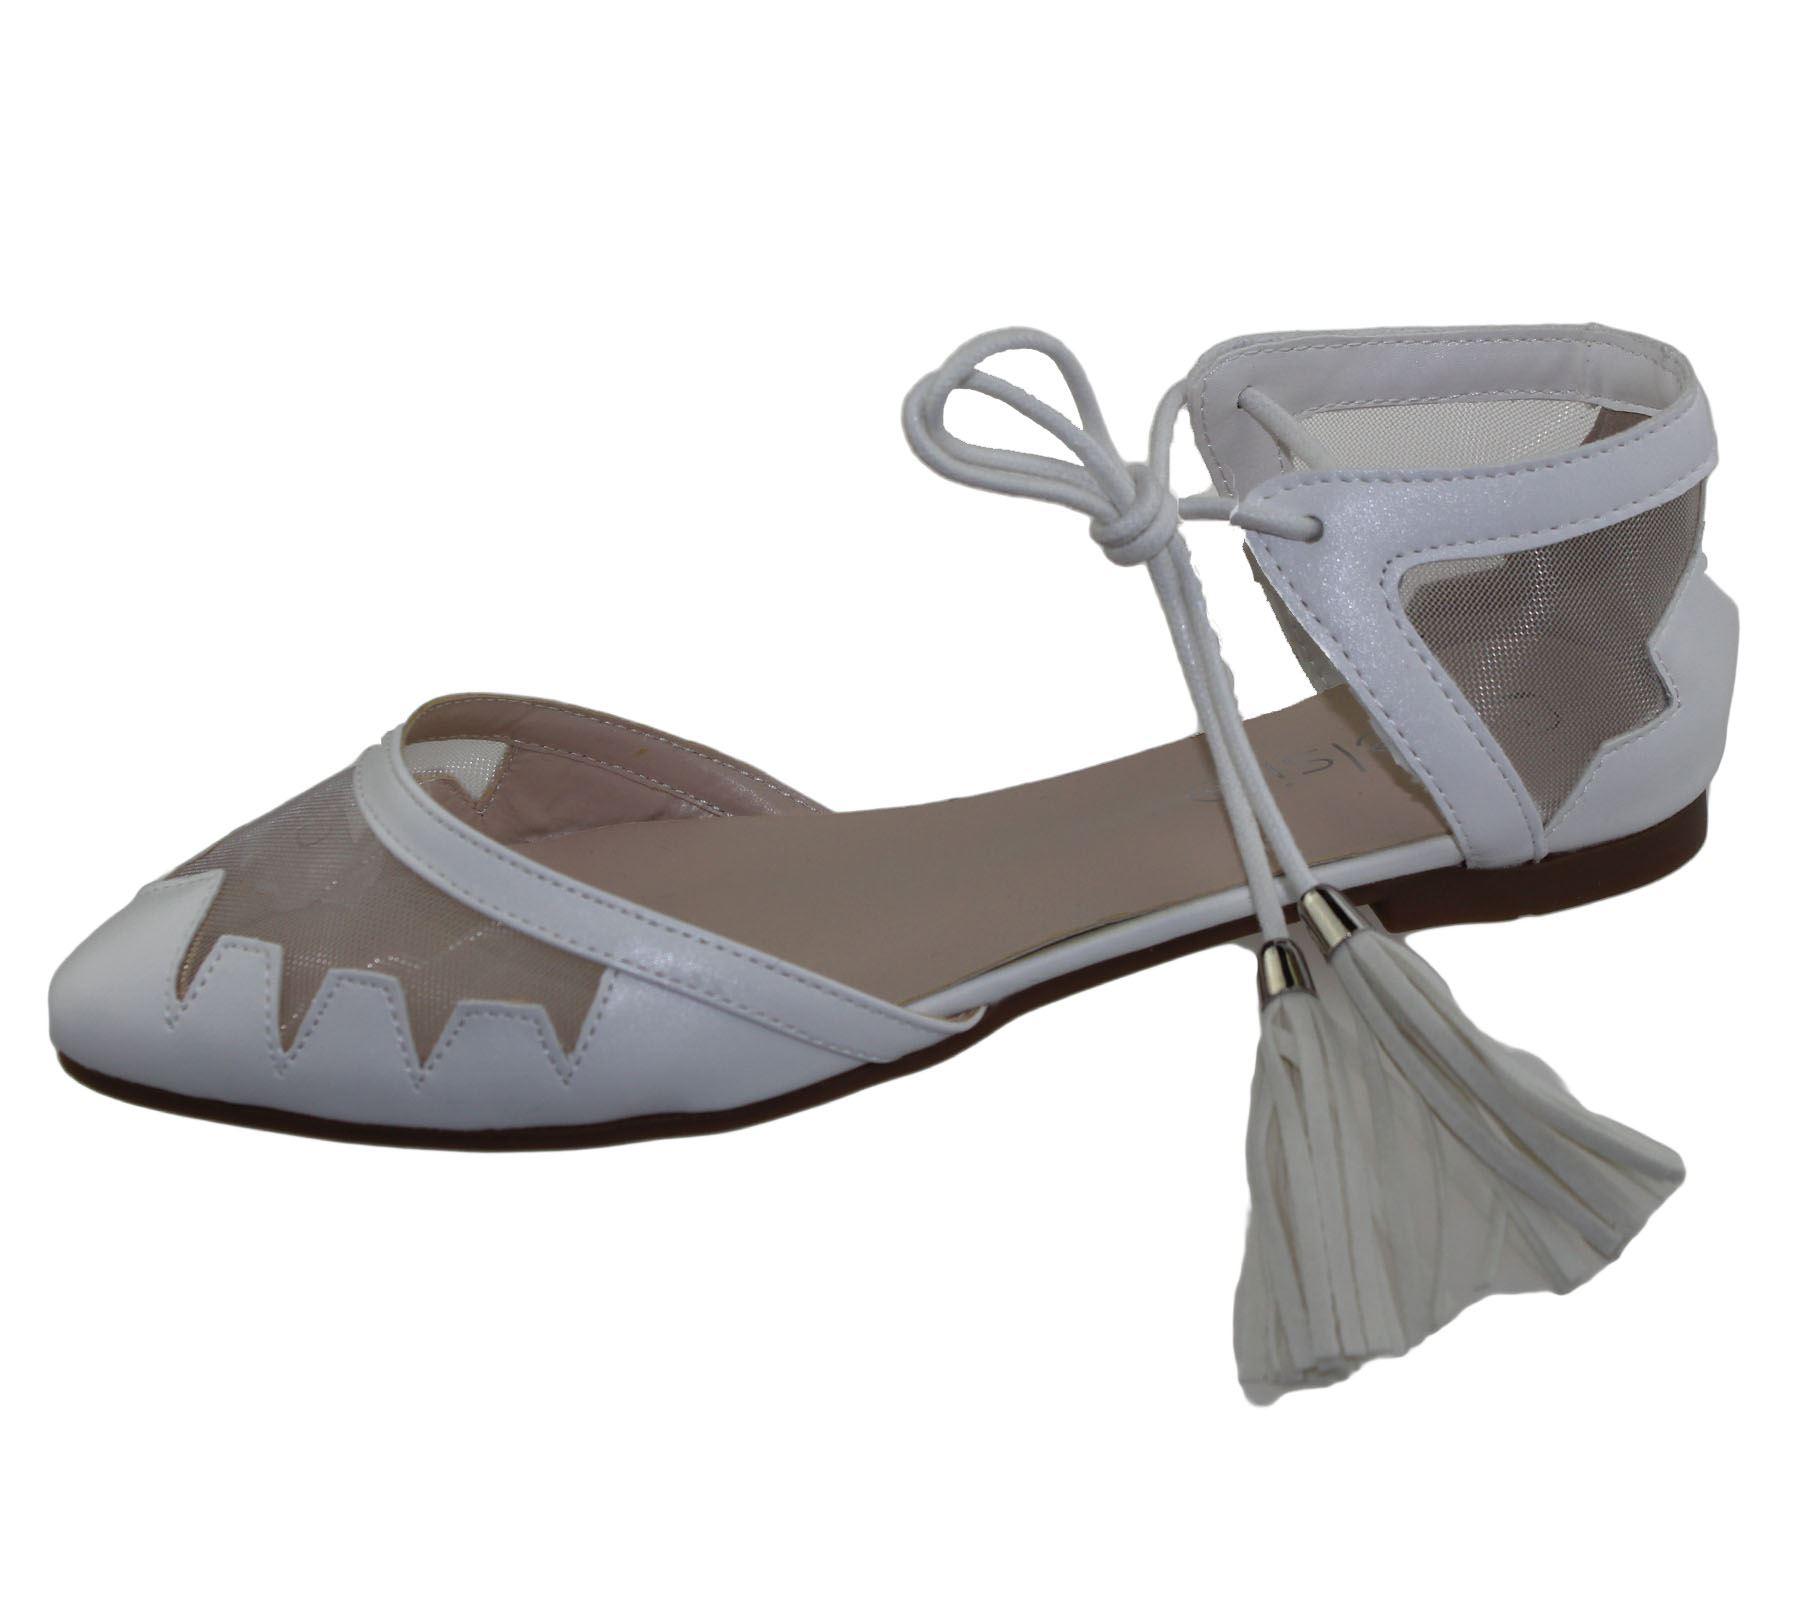 Womens-Flat-Ballerina-Dolly-Pumps-Ballet-Ladies-Summer-Mesh-Tassel-Shoes-Sandals thumbnail 20